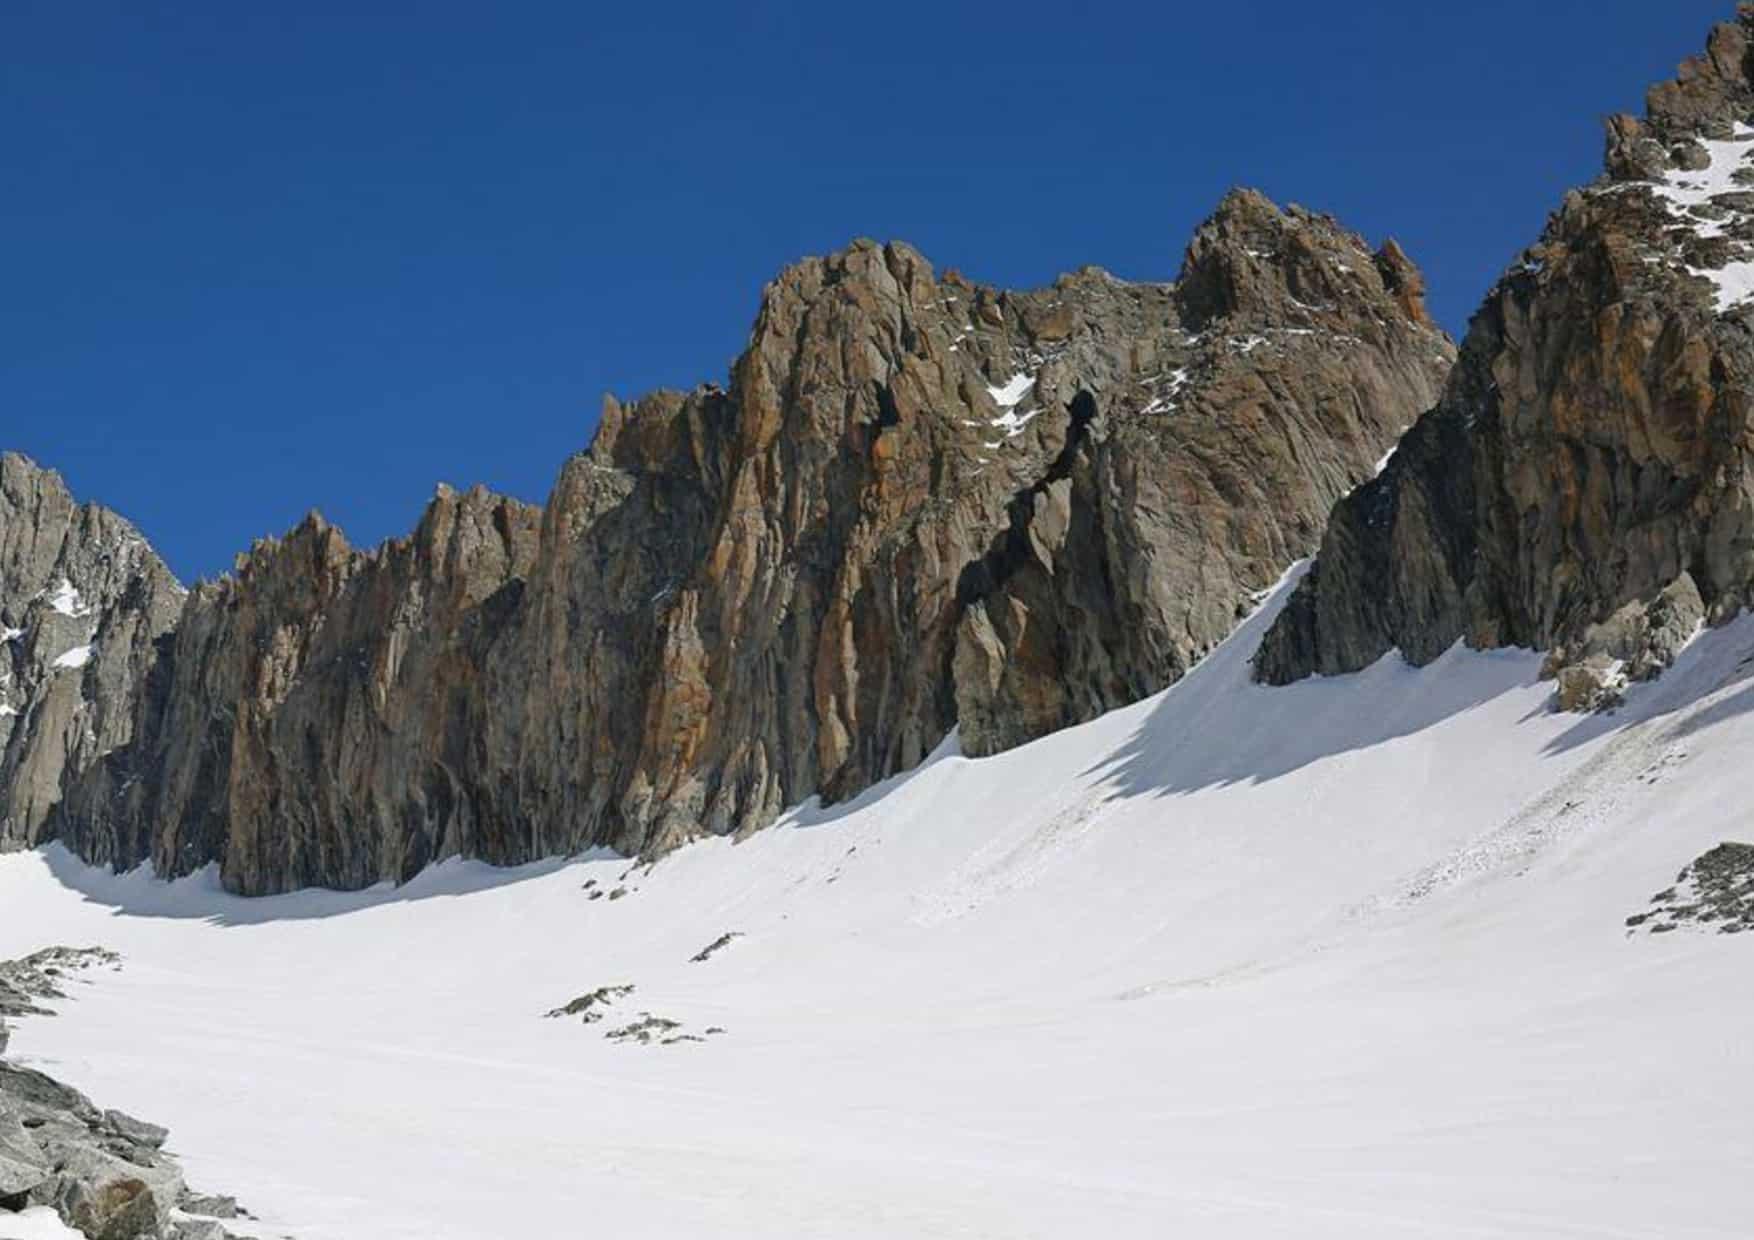 Klettern an den Dammazwillingen